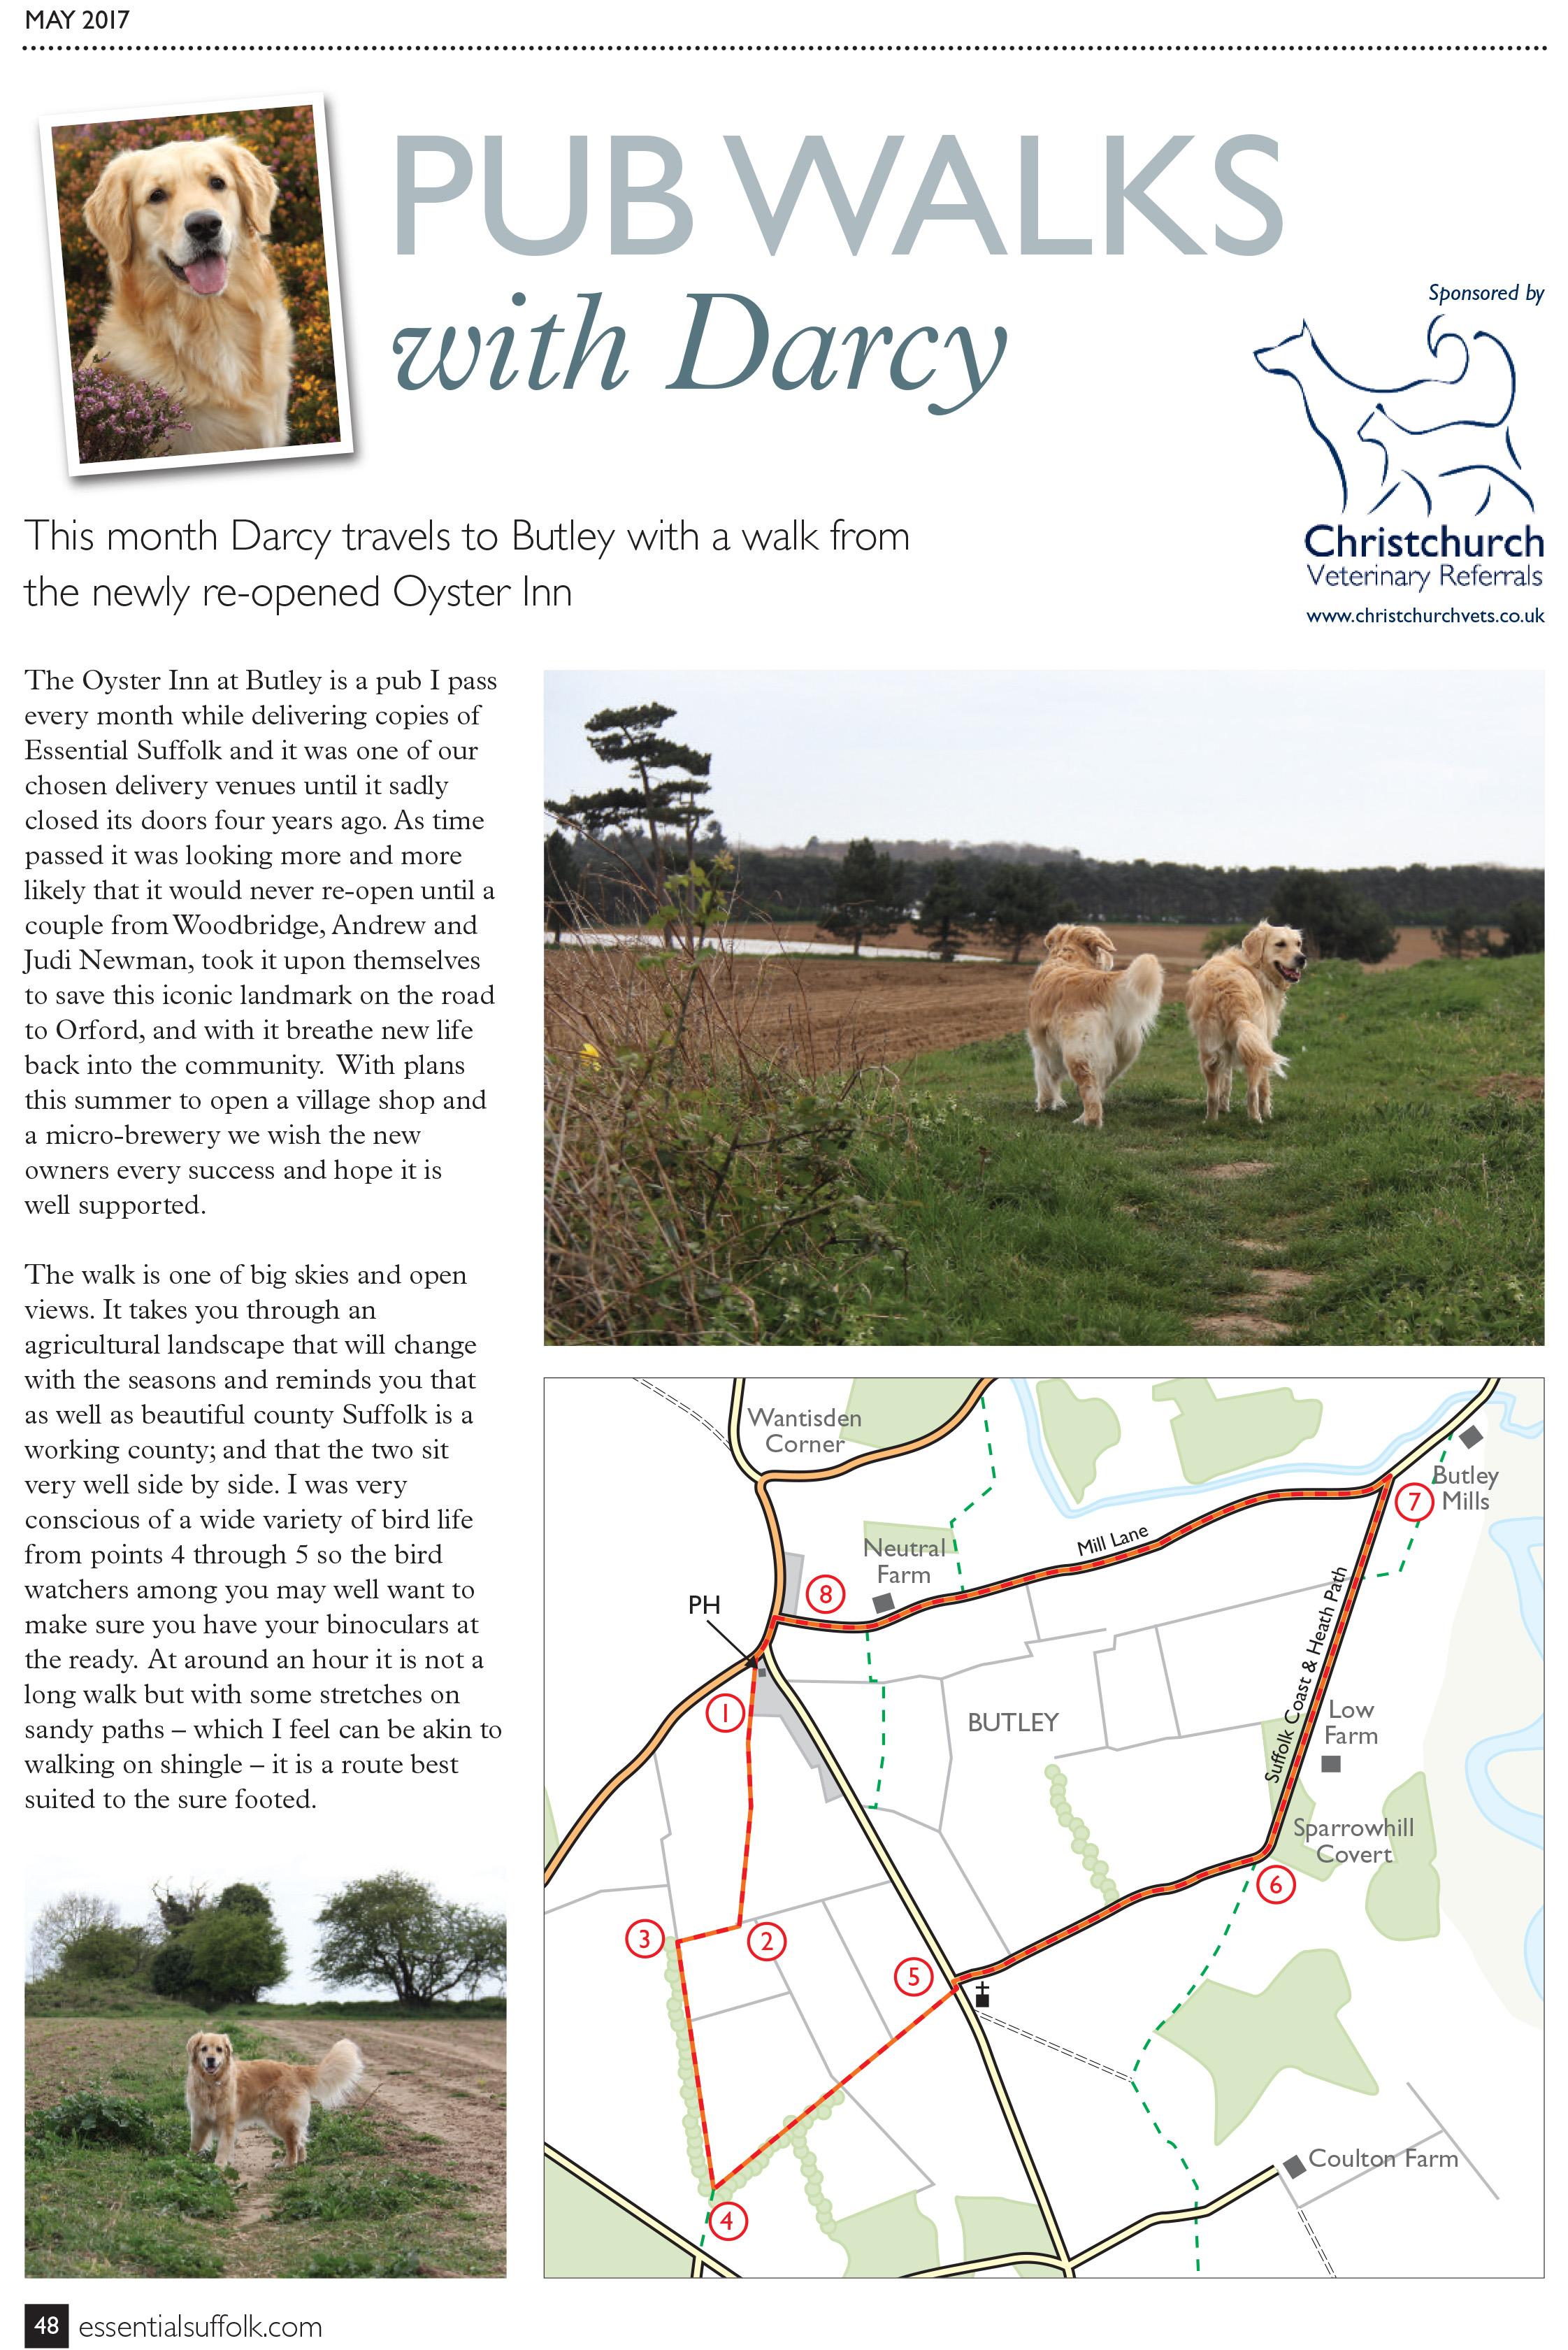 Butley Dog Walk page 1